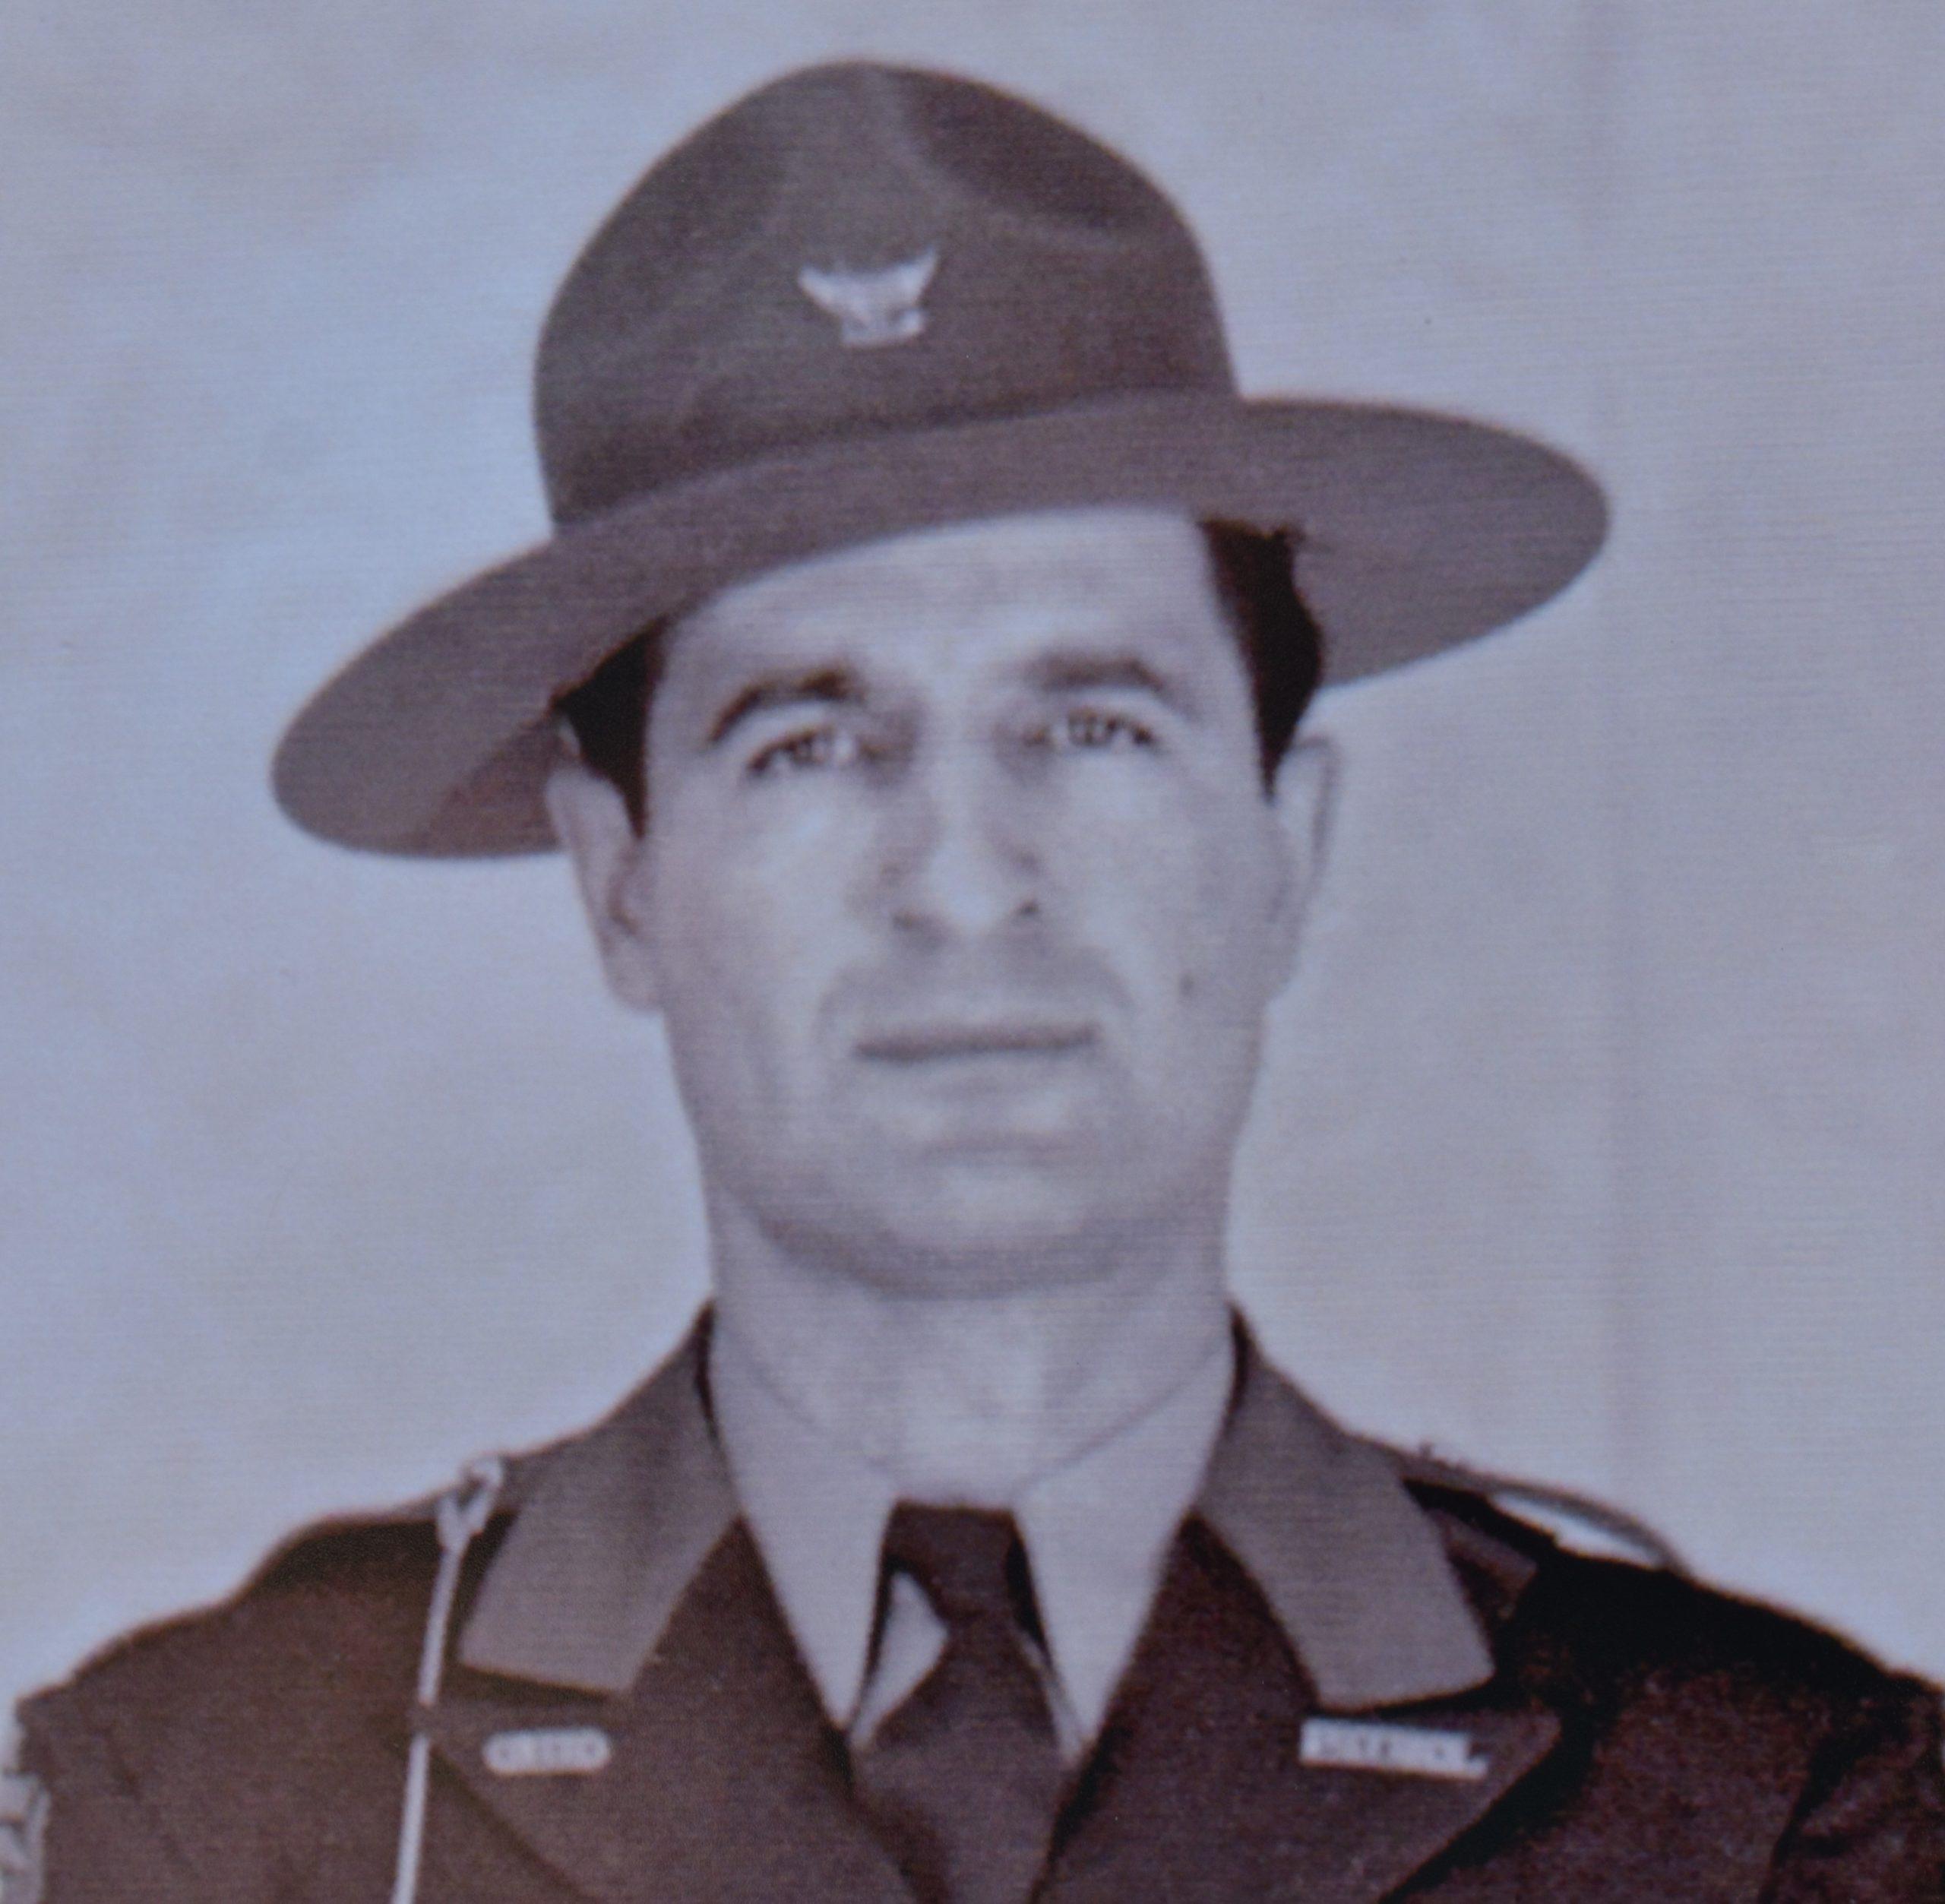 James A. Fredericka